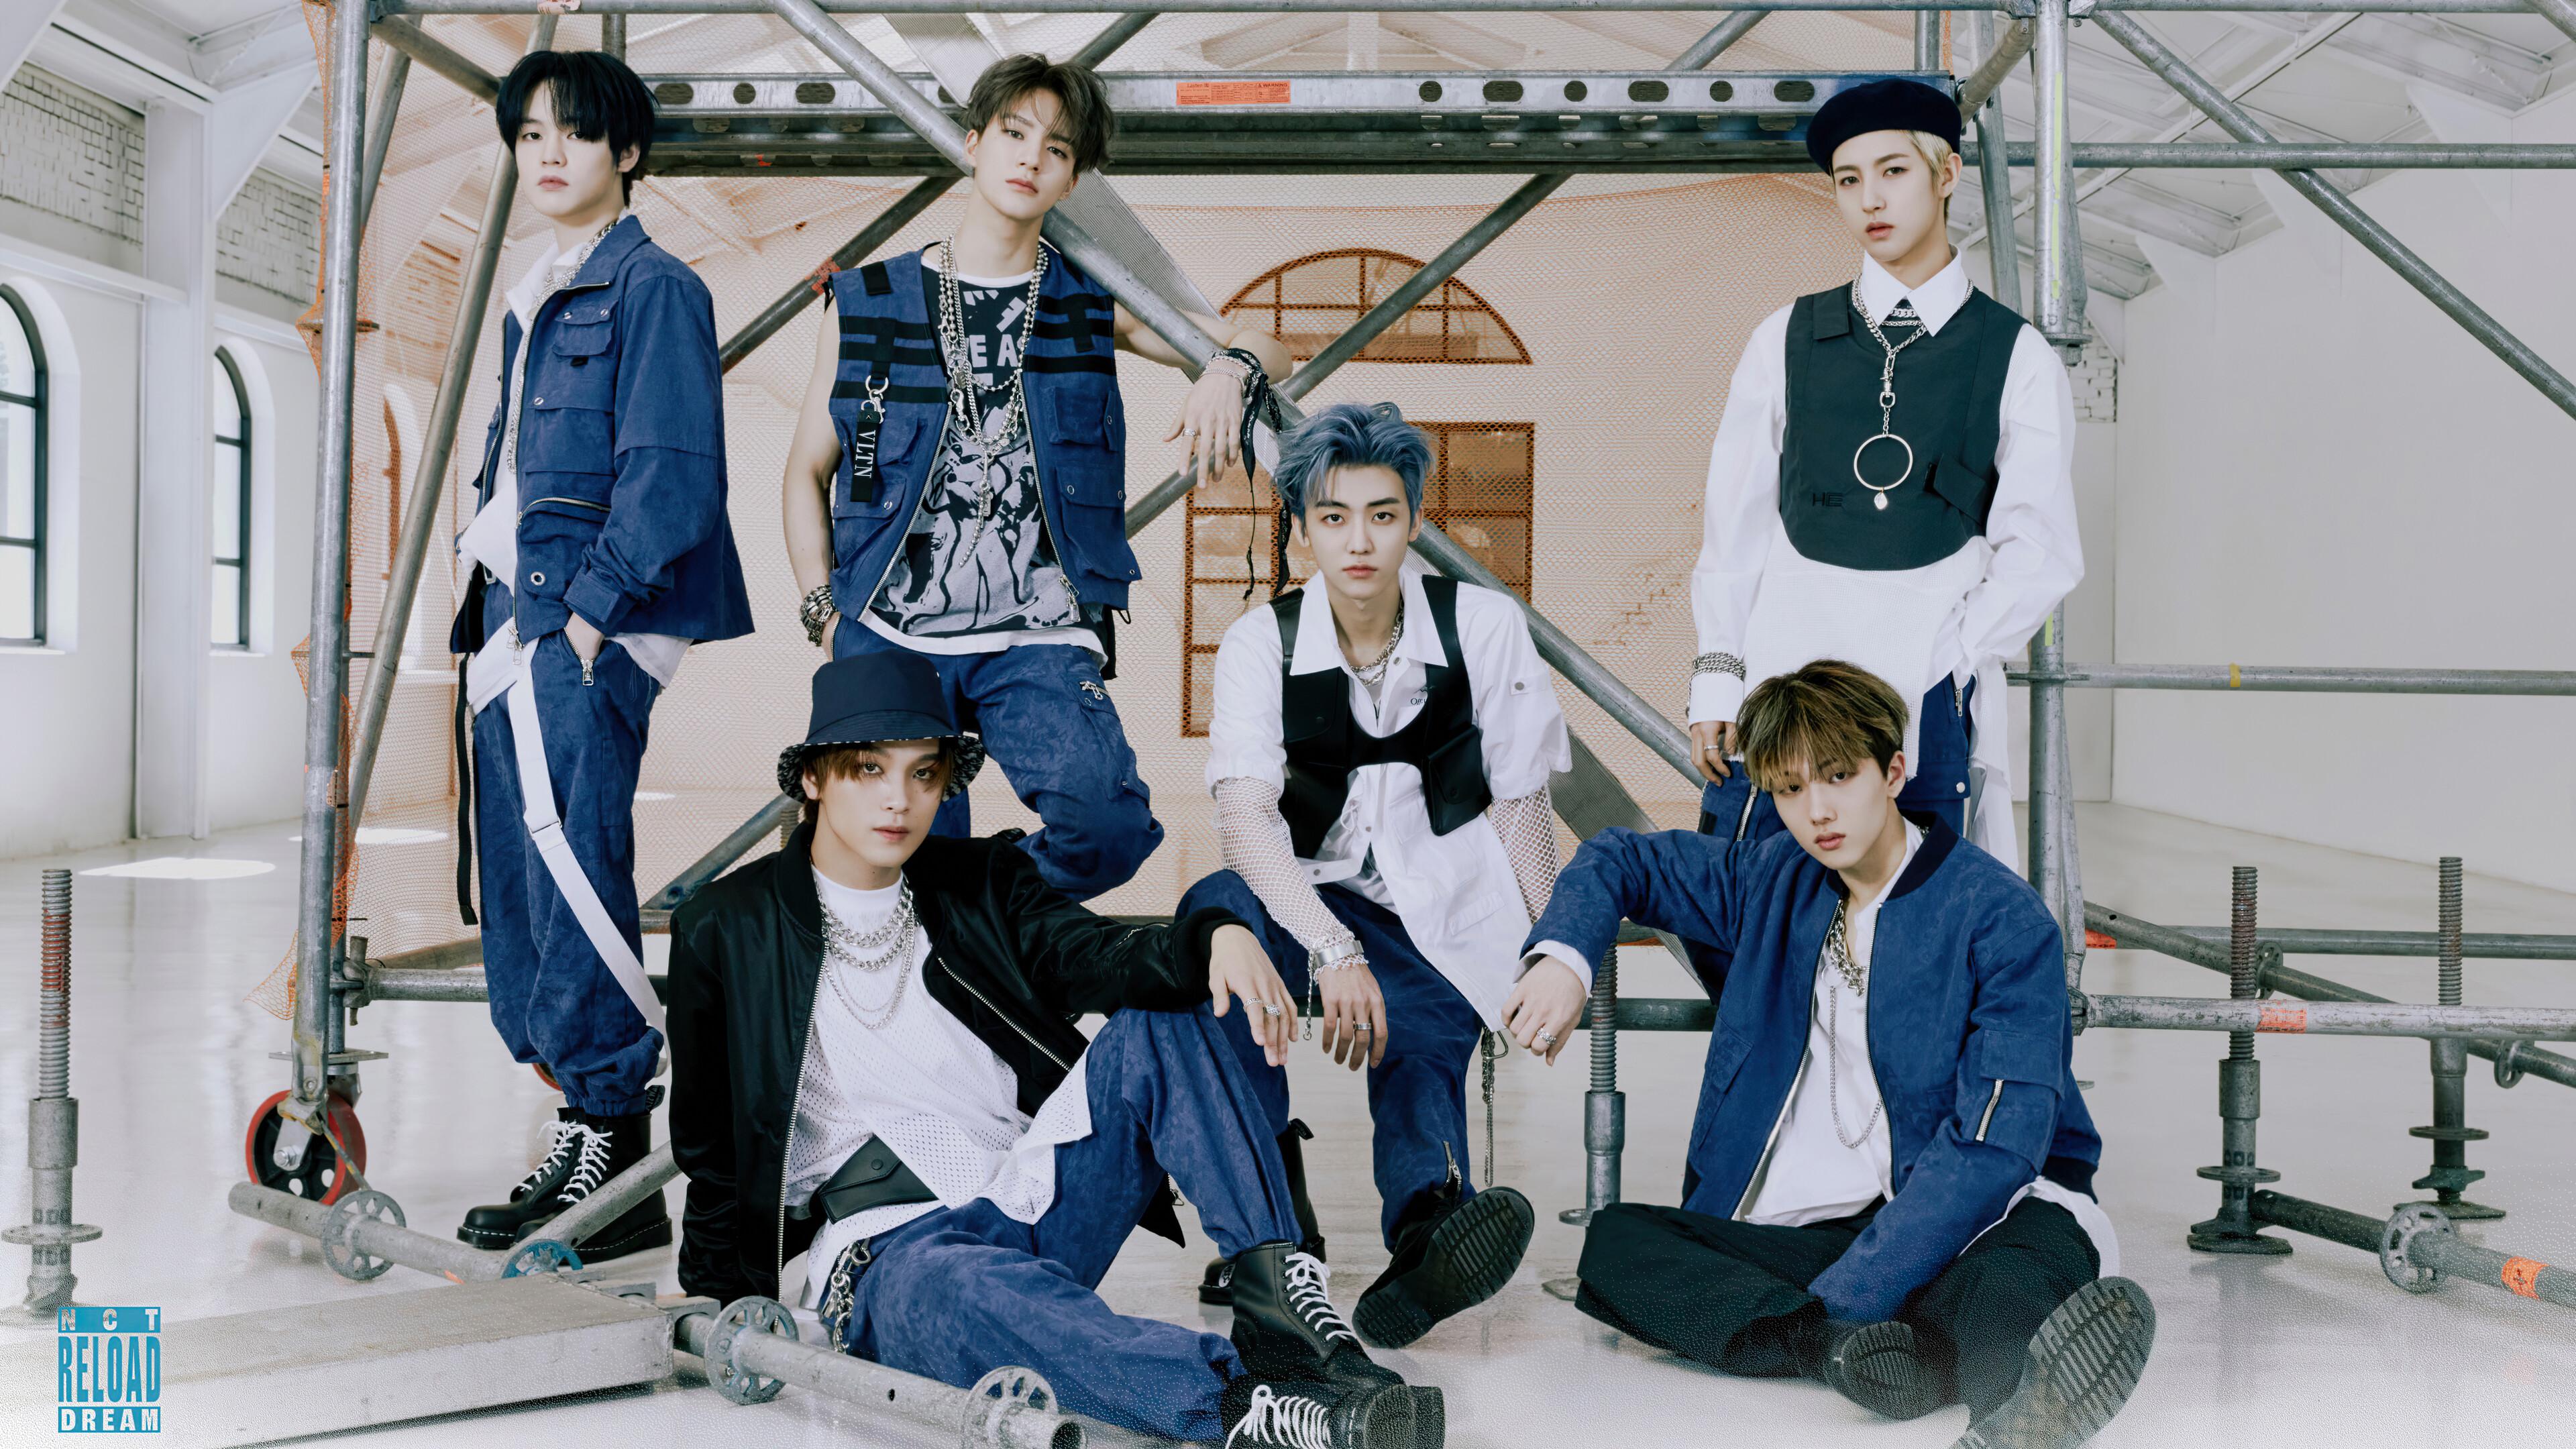 NCT Dream Ridin All Members 4K Wallpaper 61524 3840x2160